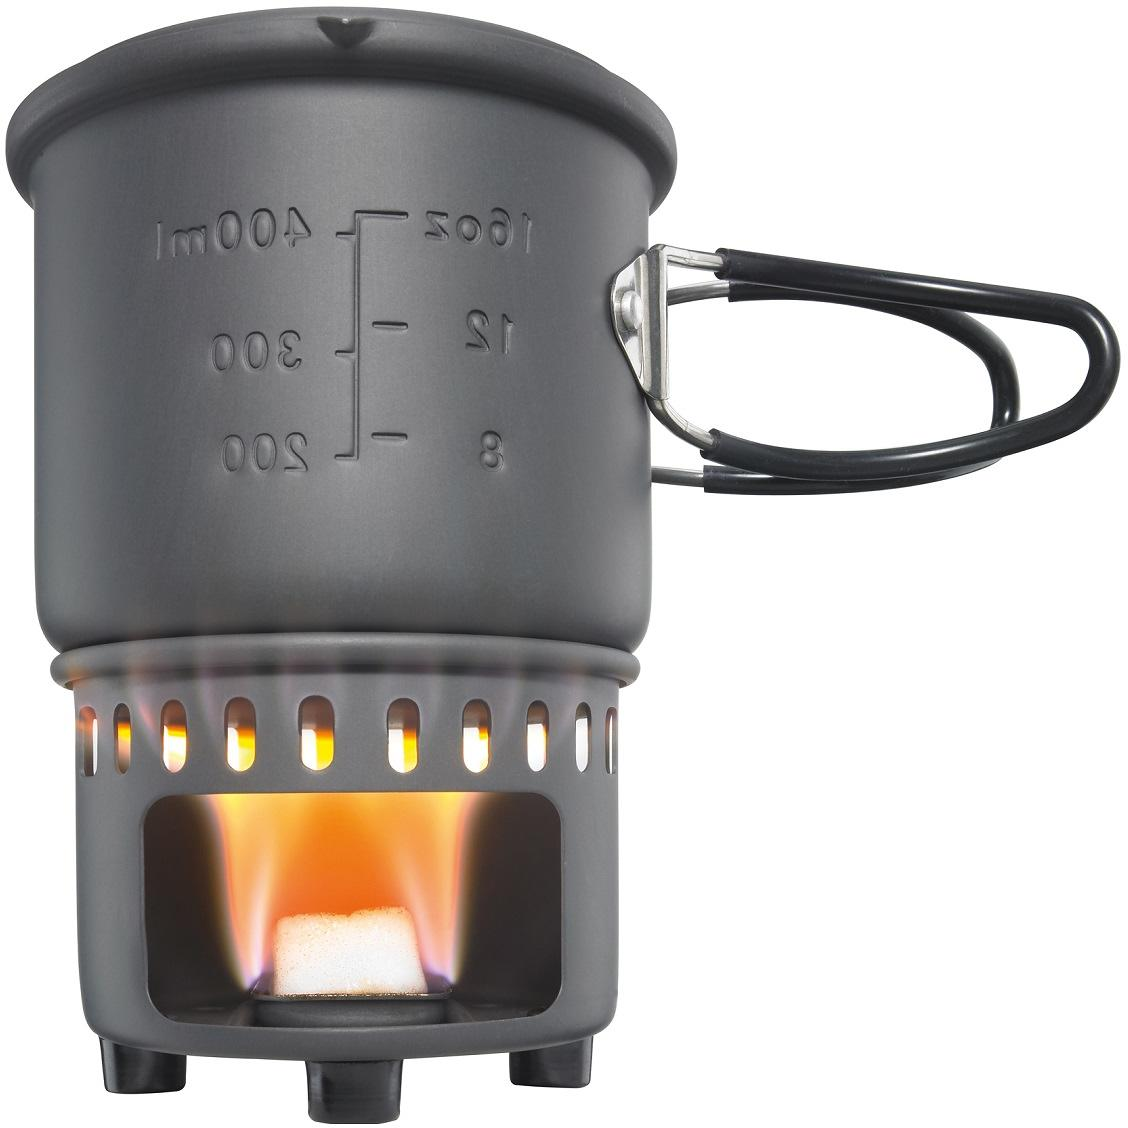 Esbit Trockenbrennstoff-Kochset Aluminium mit Antihaftbeschichtung